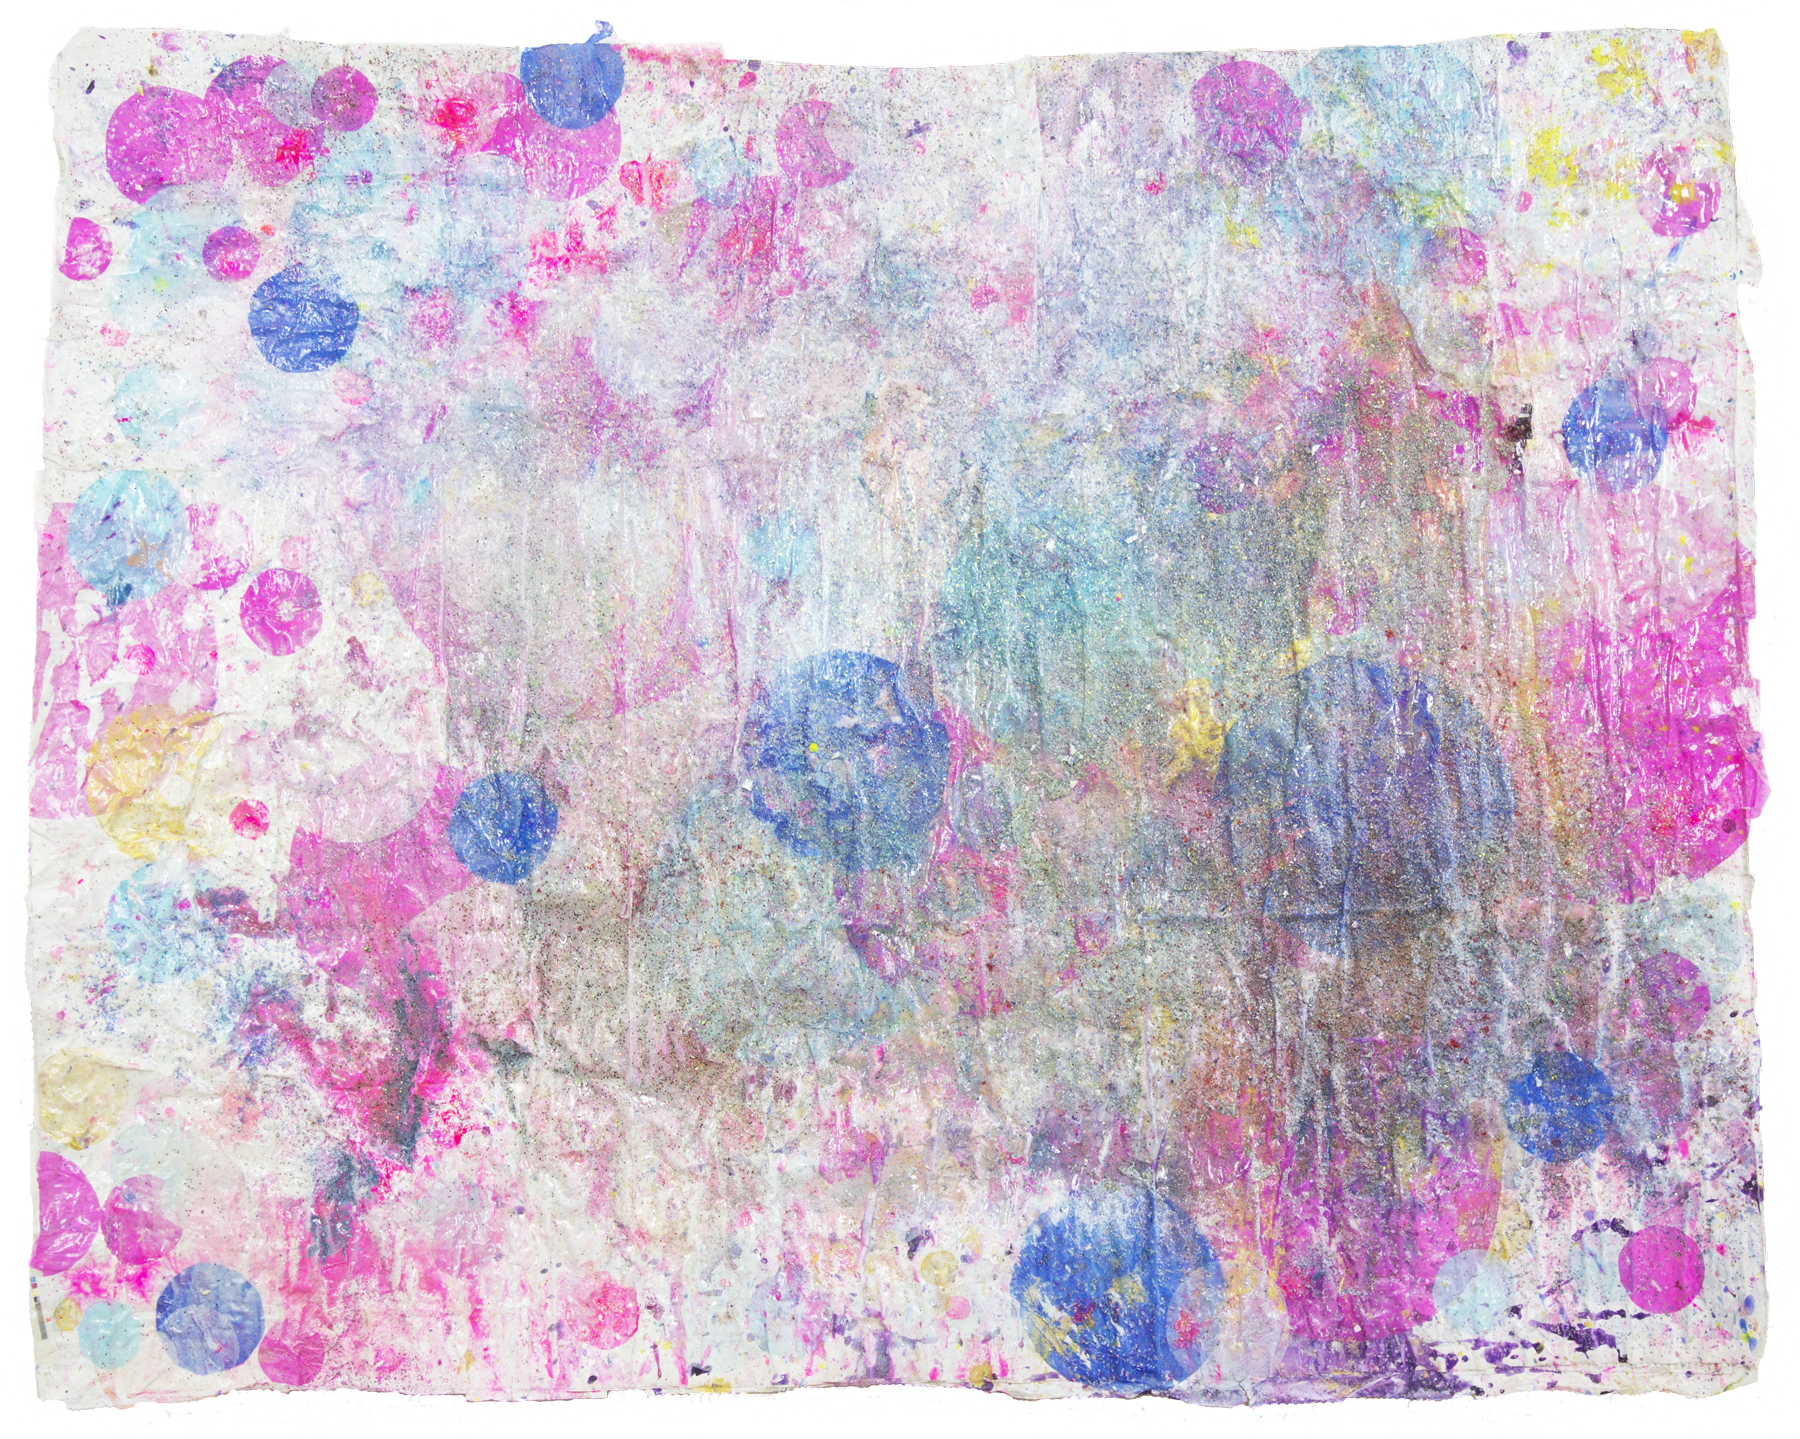 'Lumiverse NO. 2', 95 x 130 cm, acrylic paint and silk paper on a handmade paper-base. Kerstin Pressler, www.kerstinpressler.com